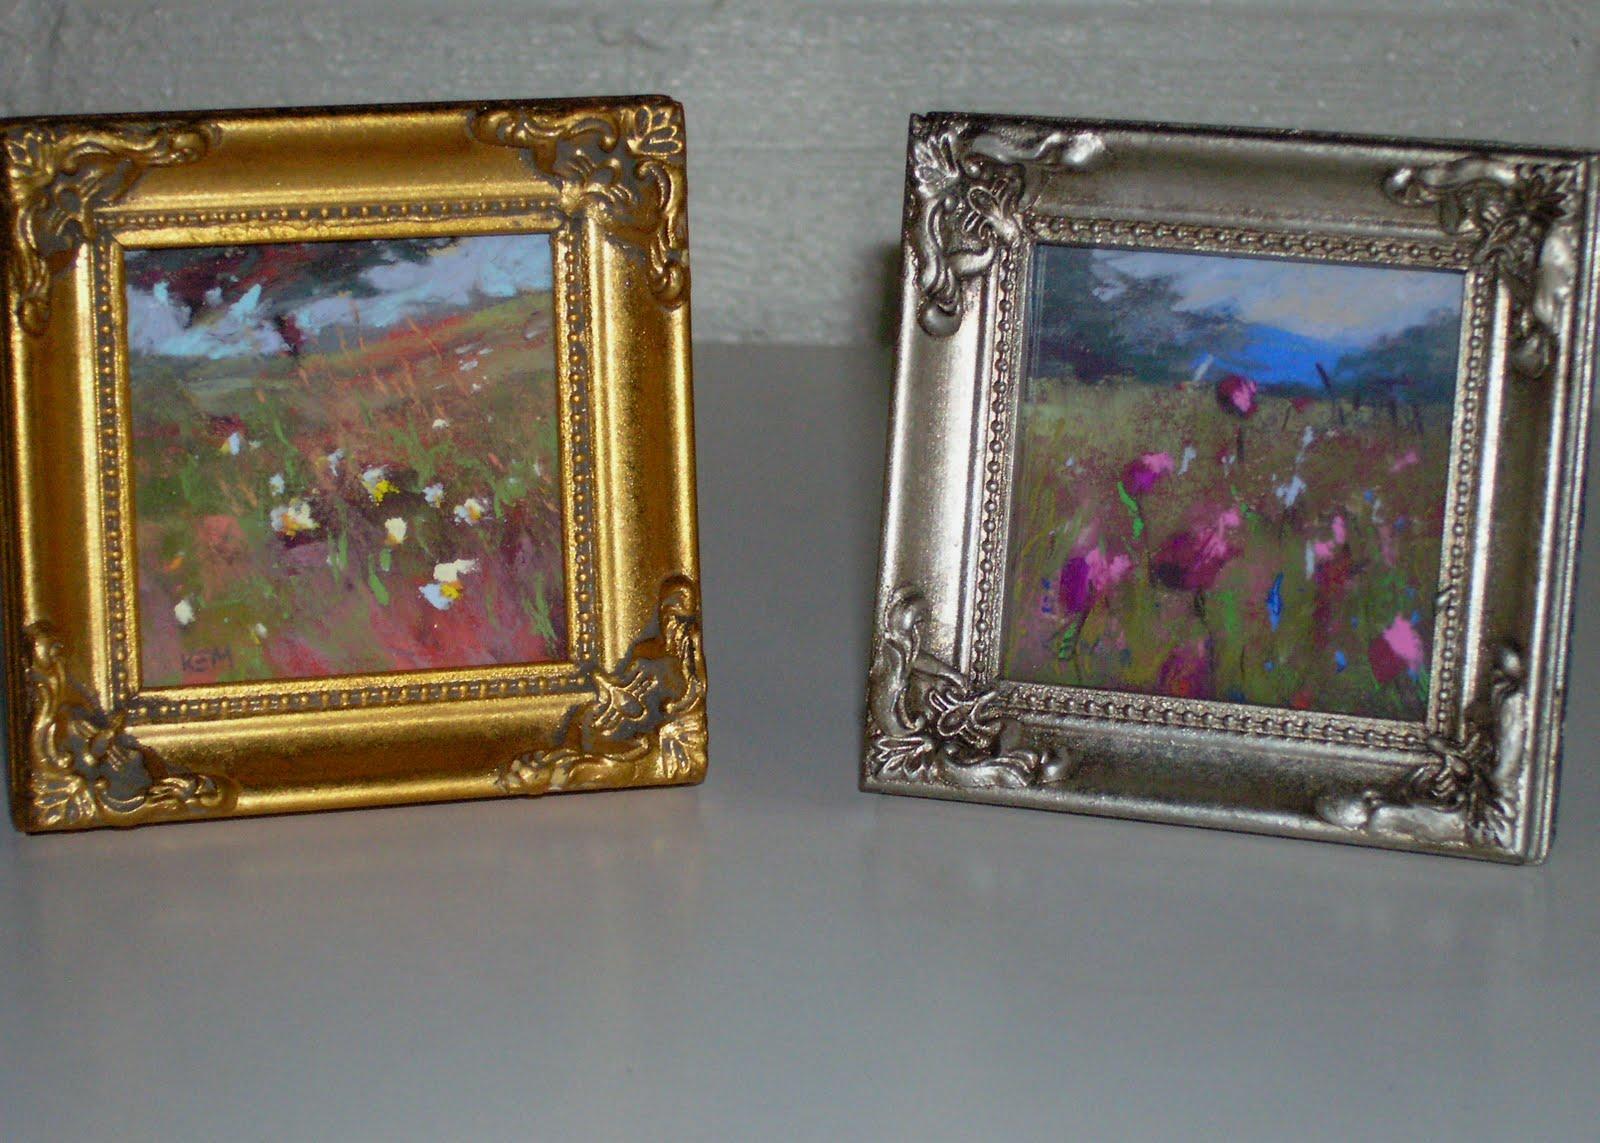 Painting My World: Wildflower Miniature Paintings 3x3